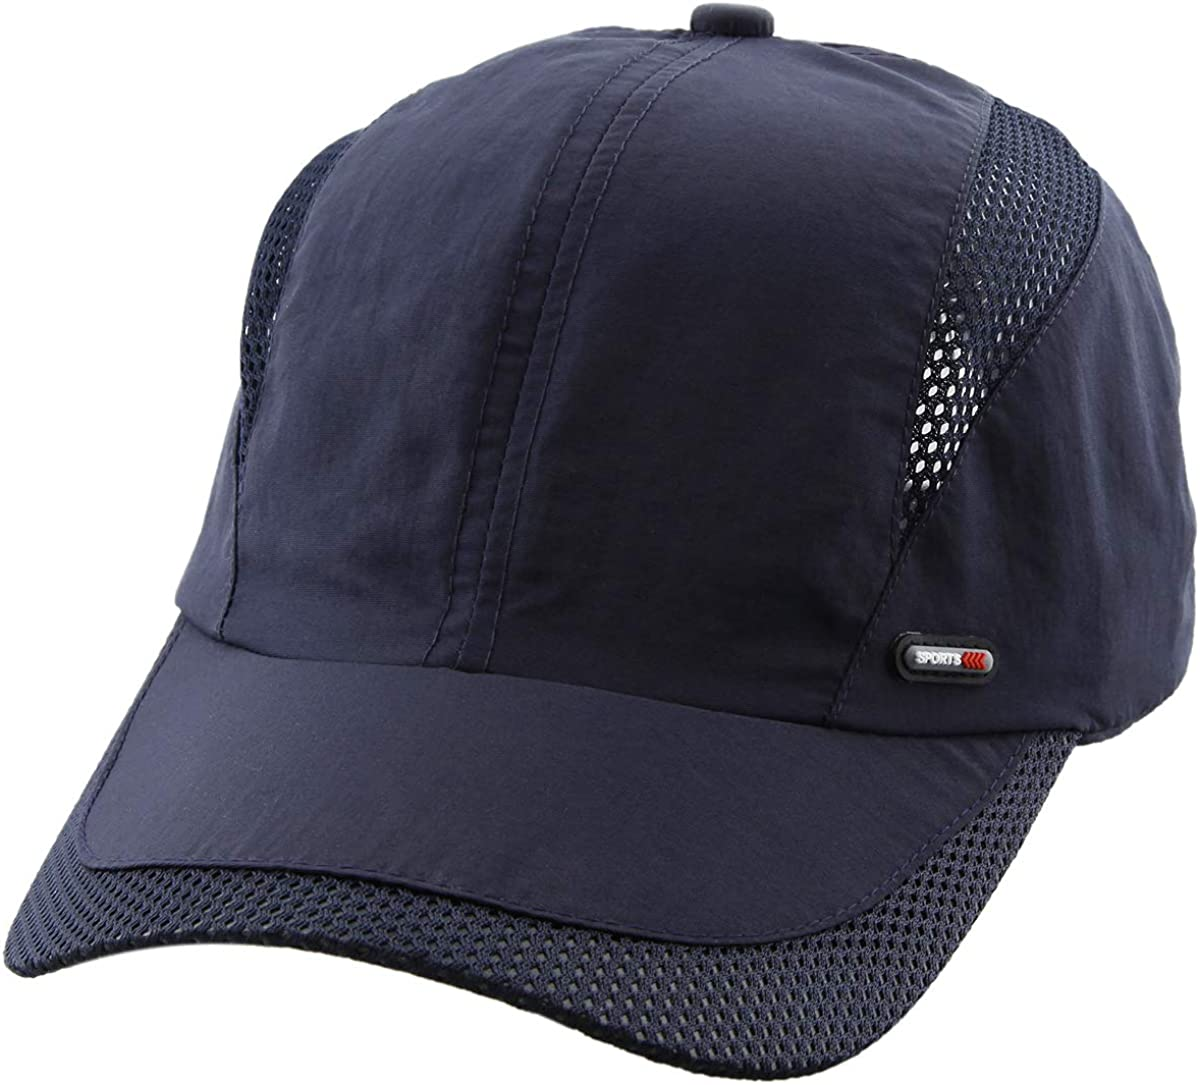 Samtree Unisex Sun Hat,Ultra Thin Quick Dry Lightweight Summer Sport Running Baseball Cap